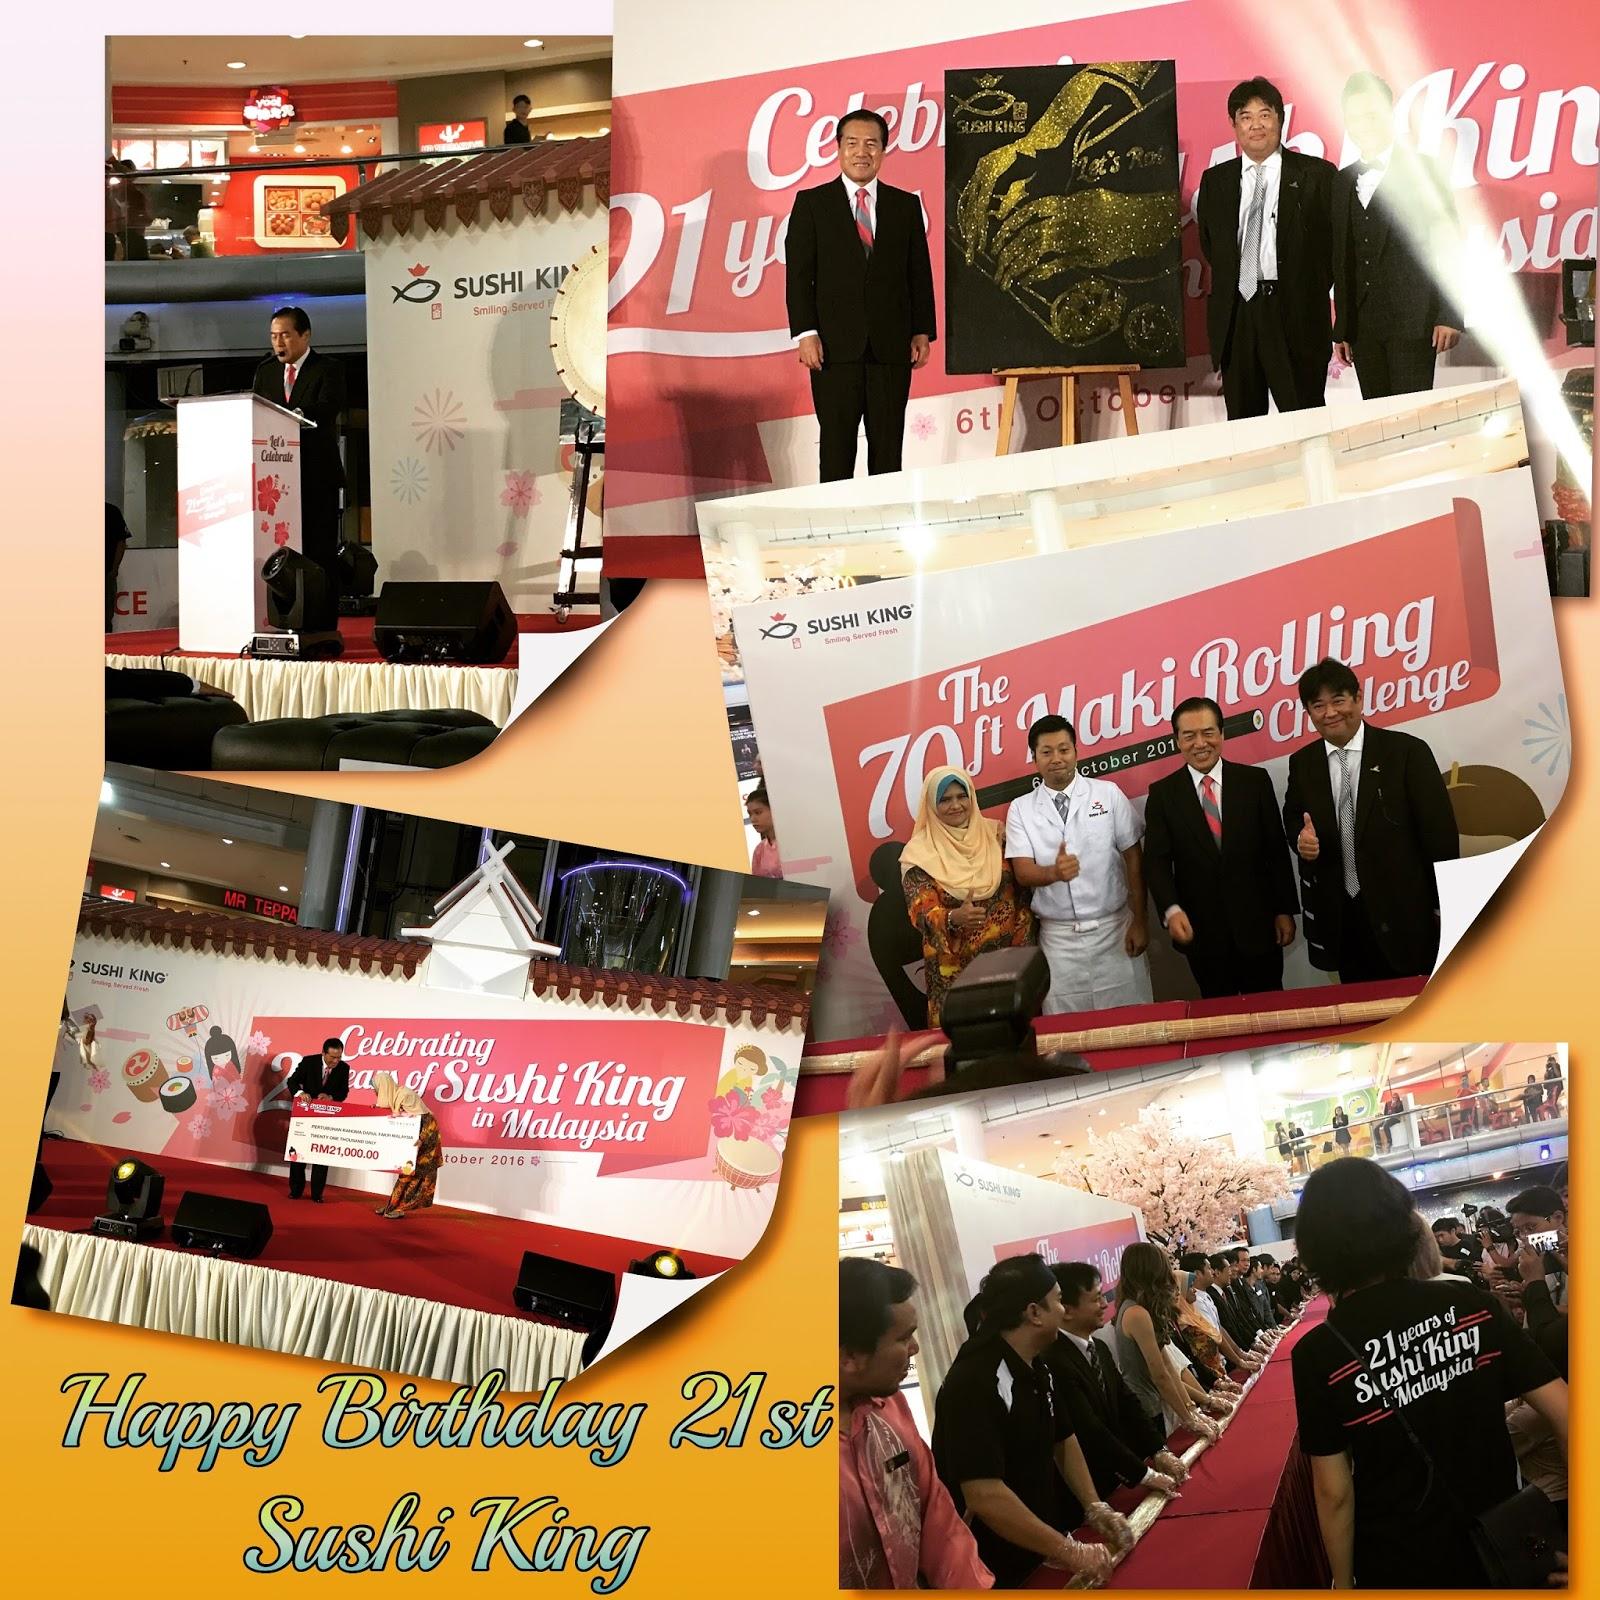 Happy Birthday 21st SUSHI KING Smile Served Fresh to all